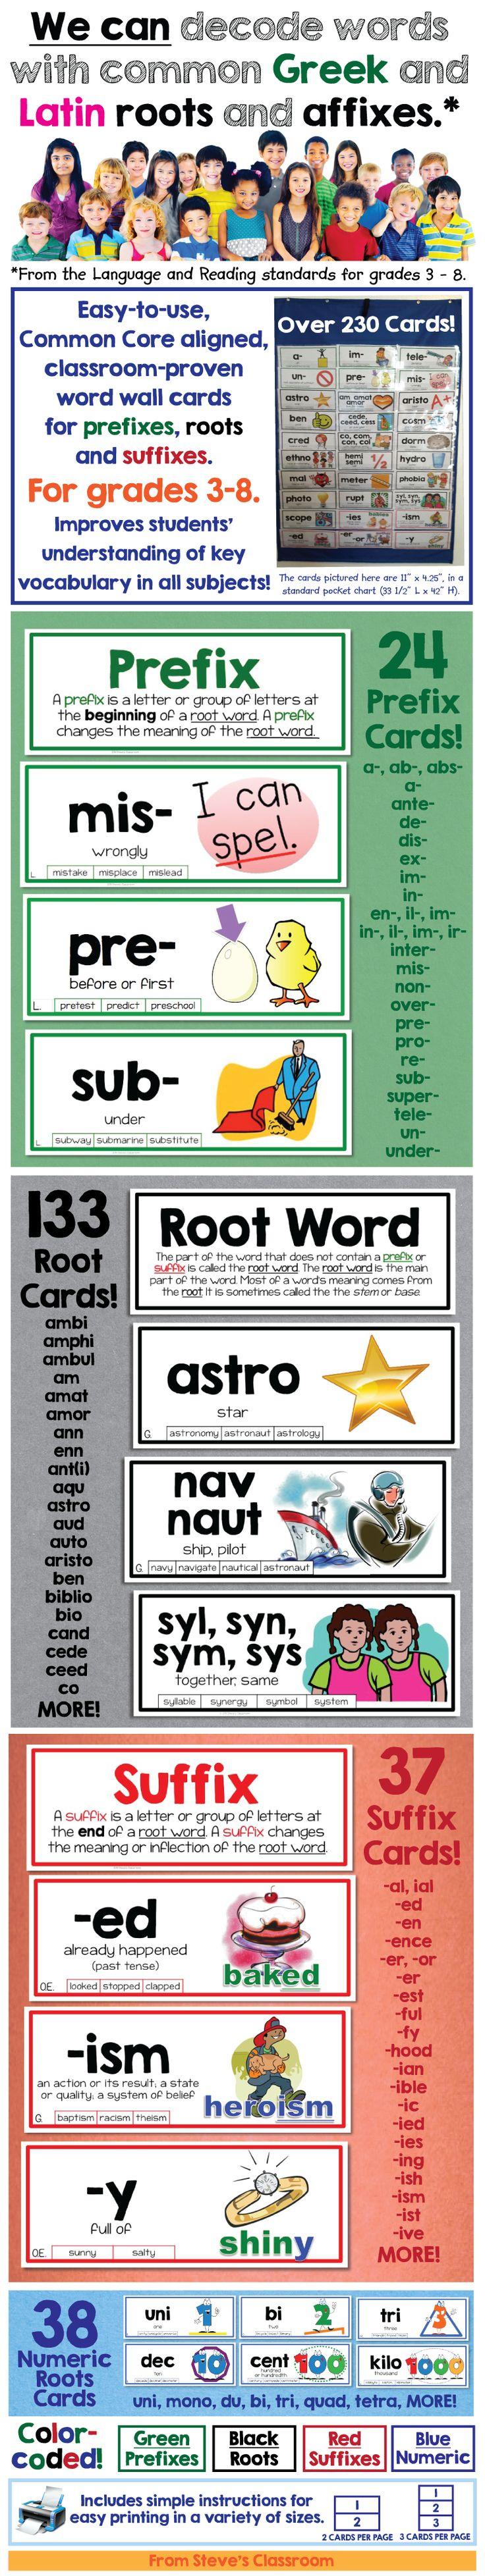 Roots Summary